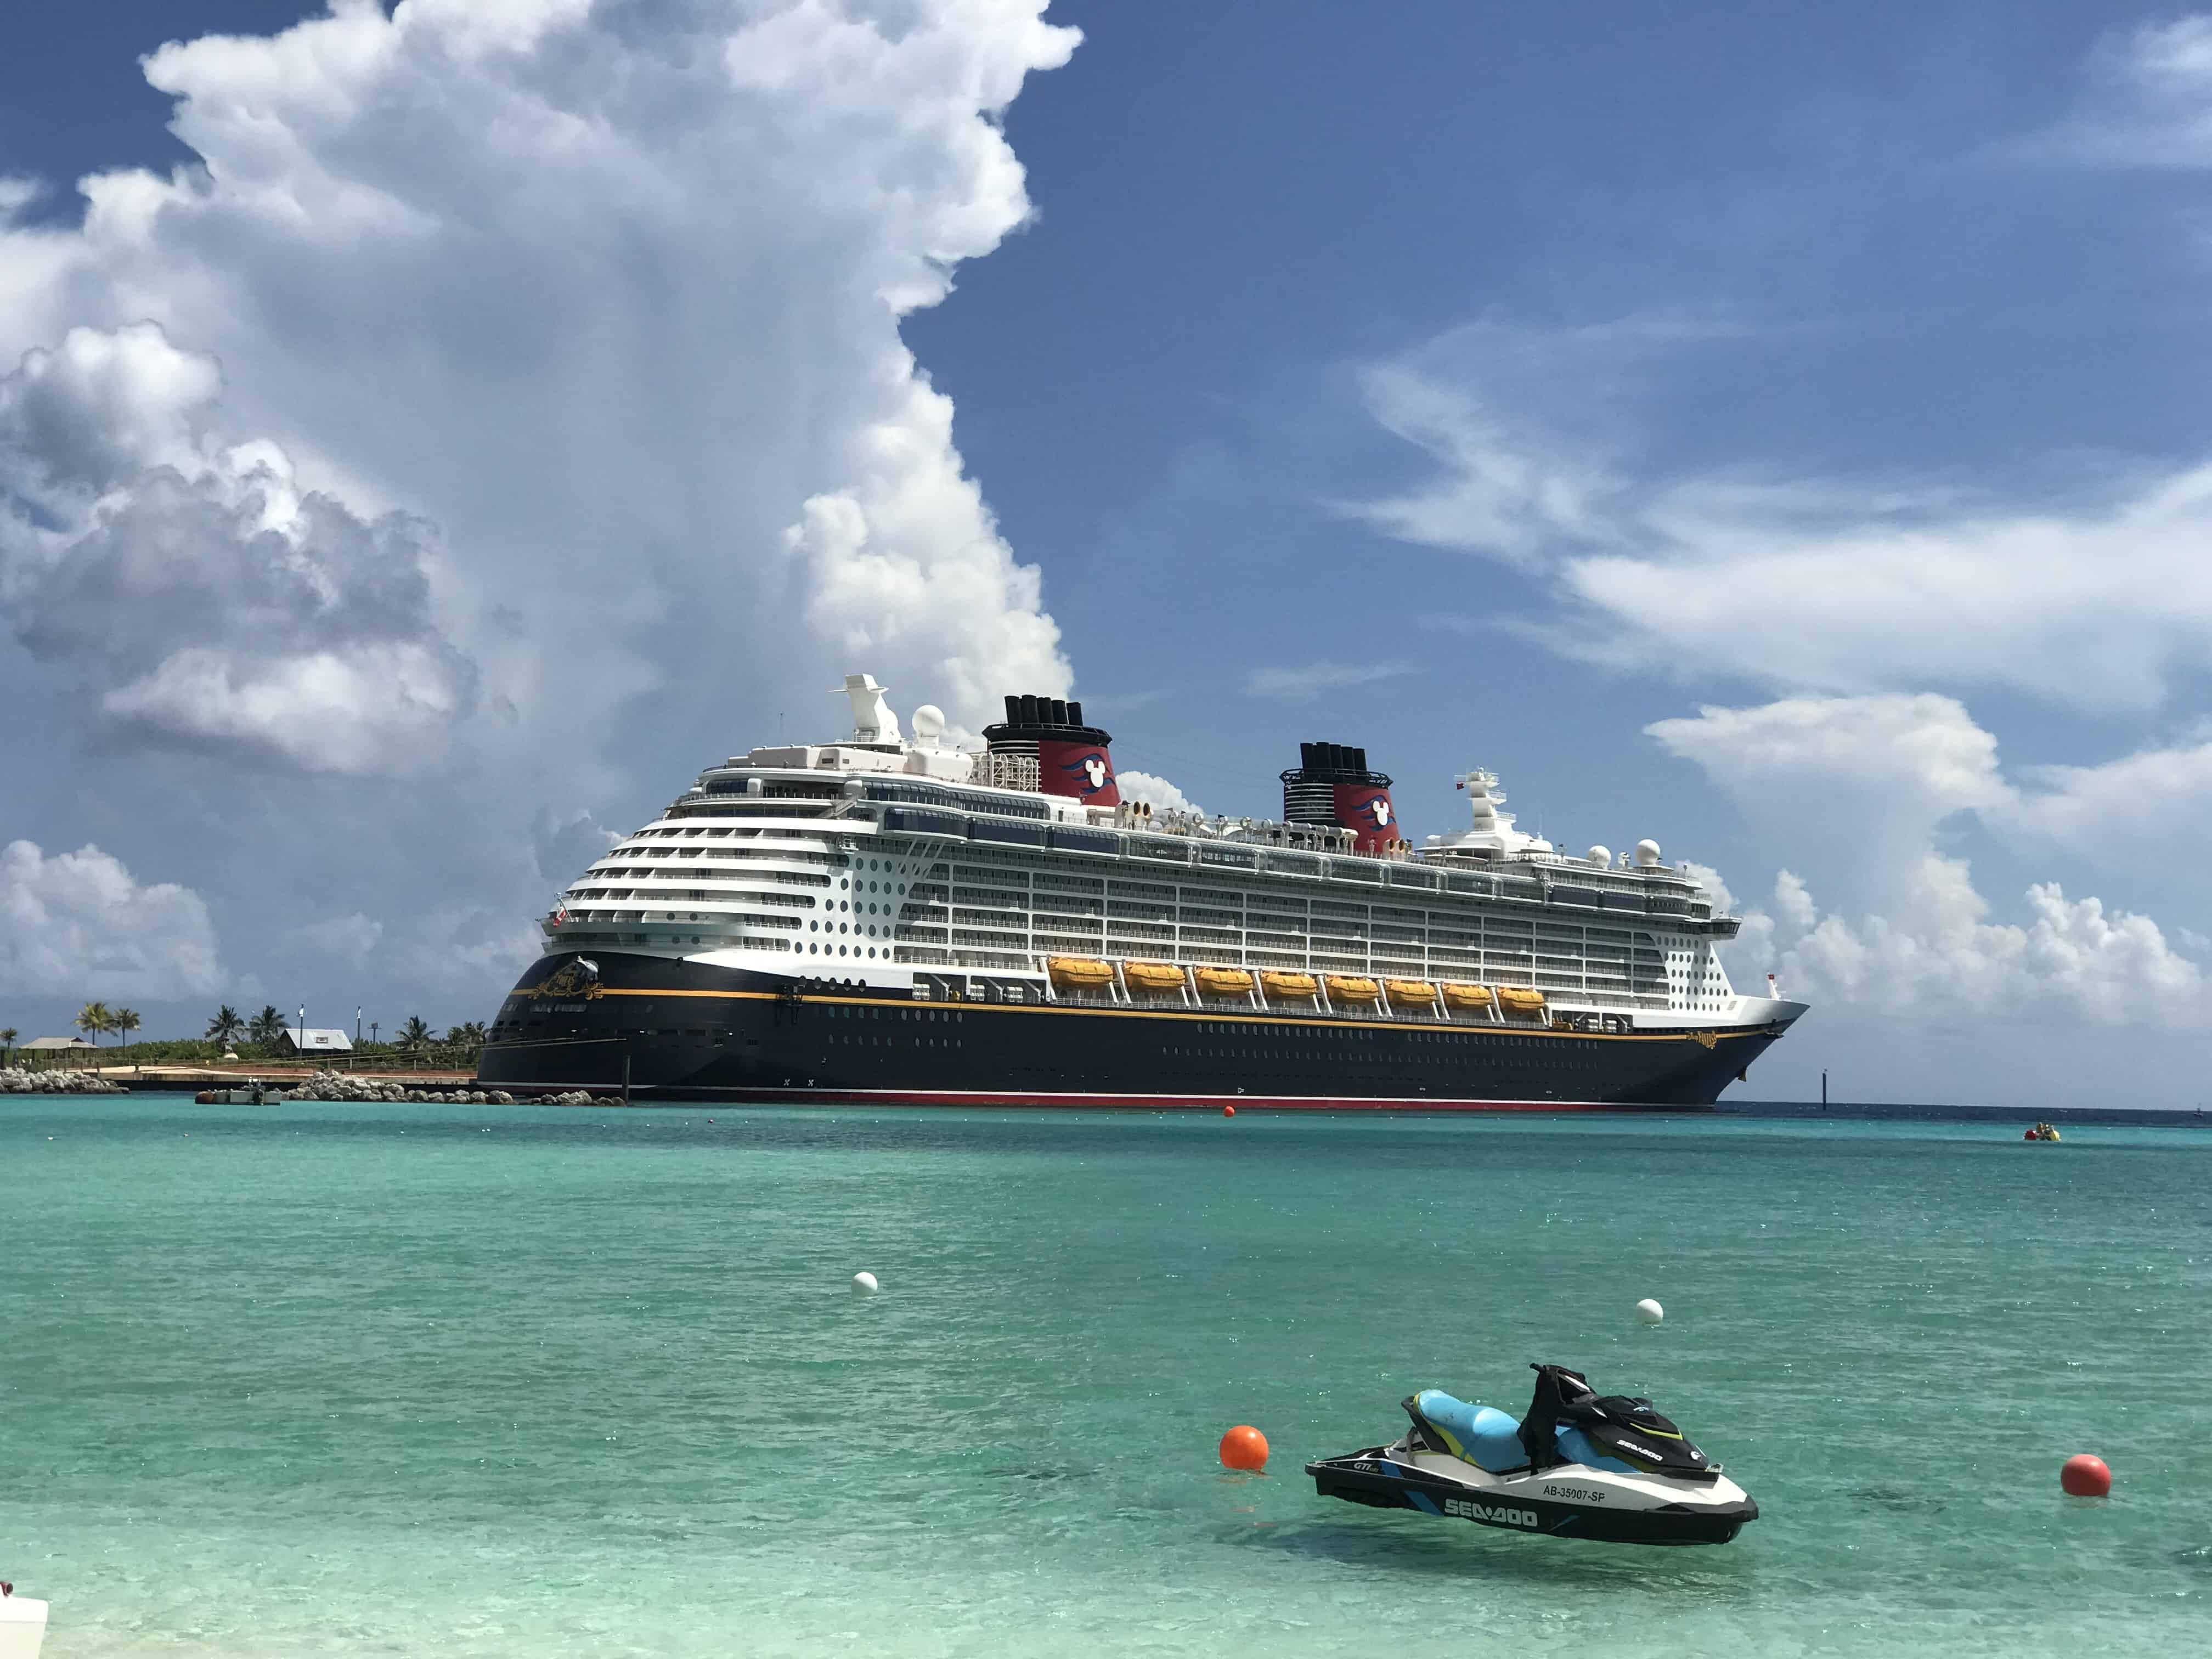 Repositioning Cruises Christmas 2020 10 Cheapest Disney Cruise Line Inside Stateroom Cruises – 05 01